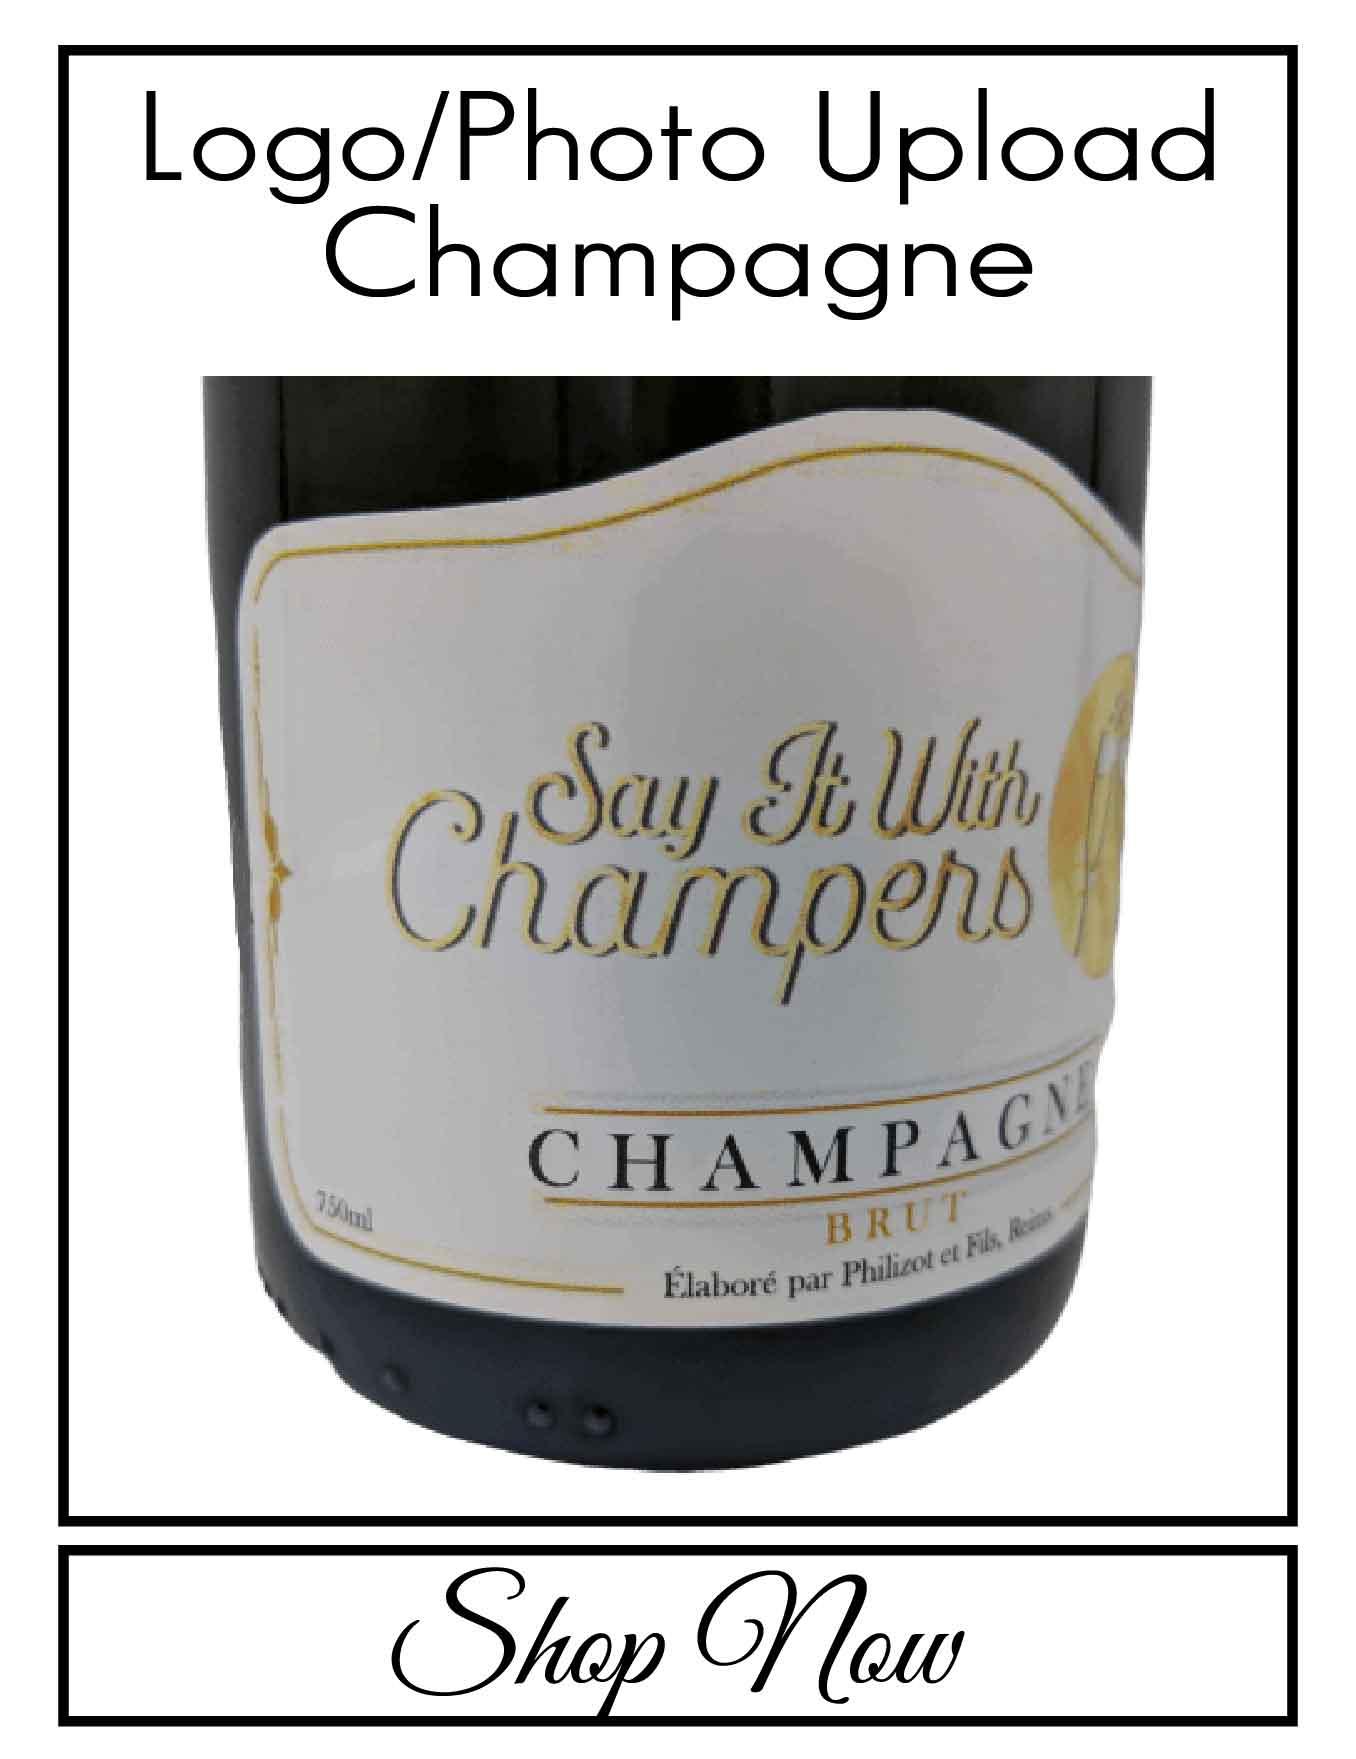 personalised Champagne bottle label delivery uk sparkling winelogo photo gift present